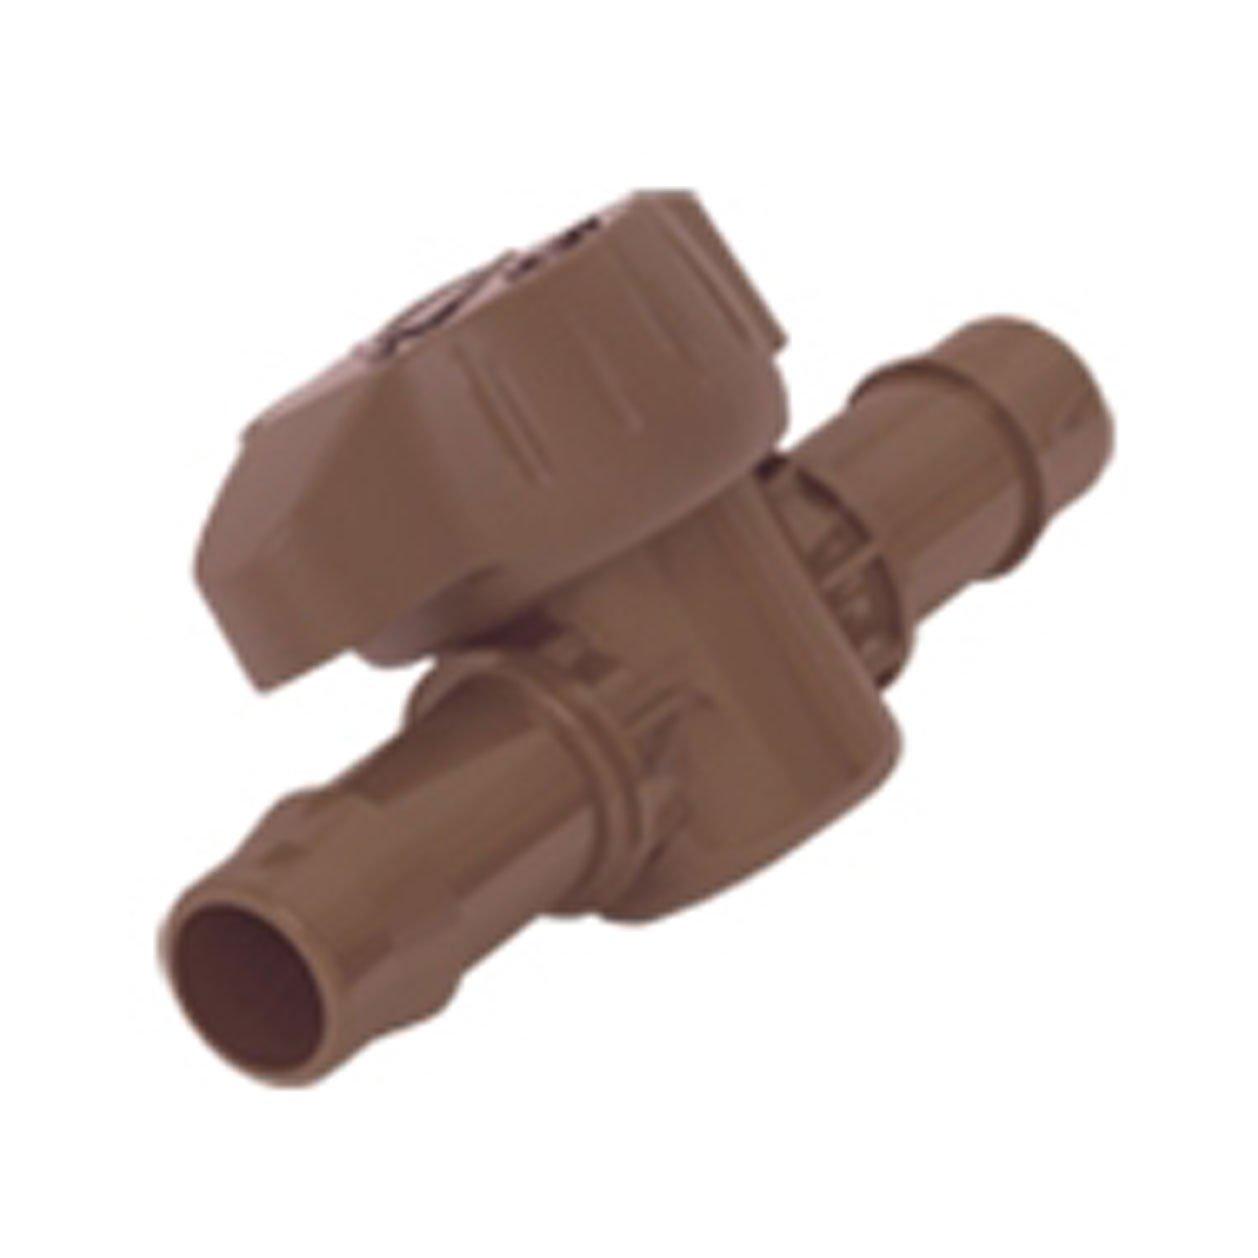 Hunter Sprinkler PLDBV Micro Irrigation Fitting Barbed Valve Standard Plumbing Supply-LG